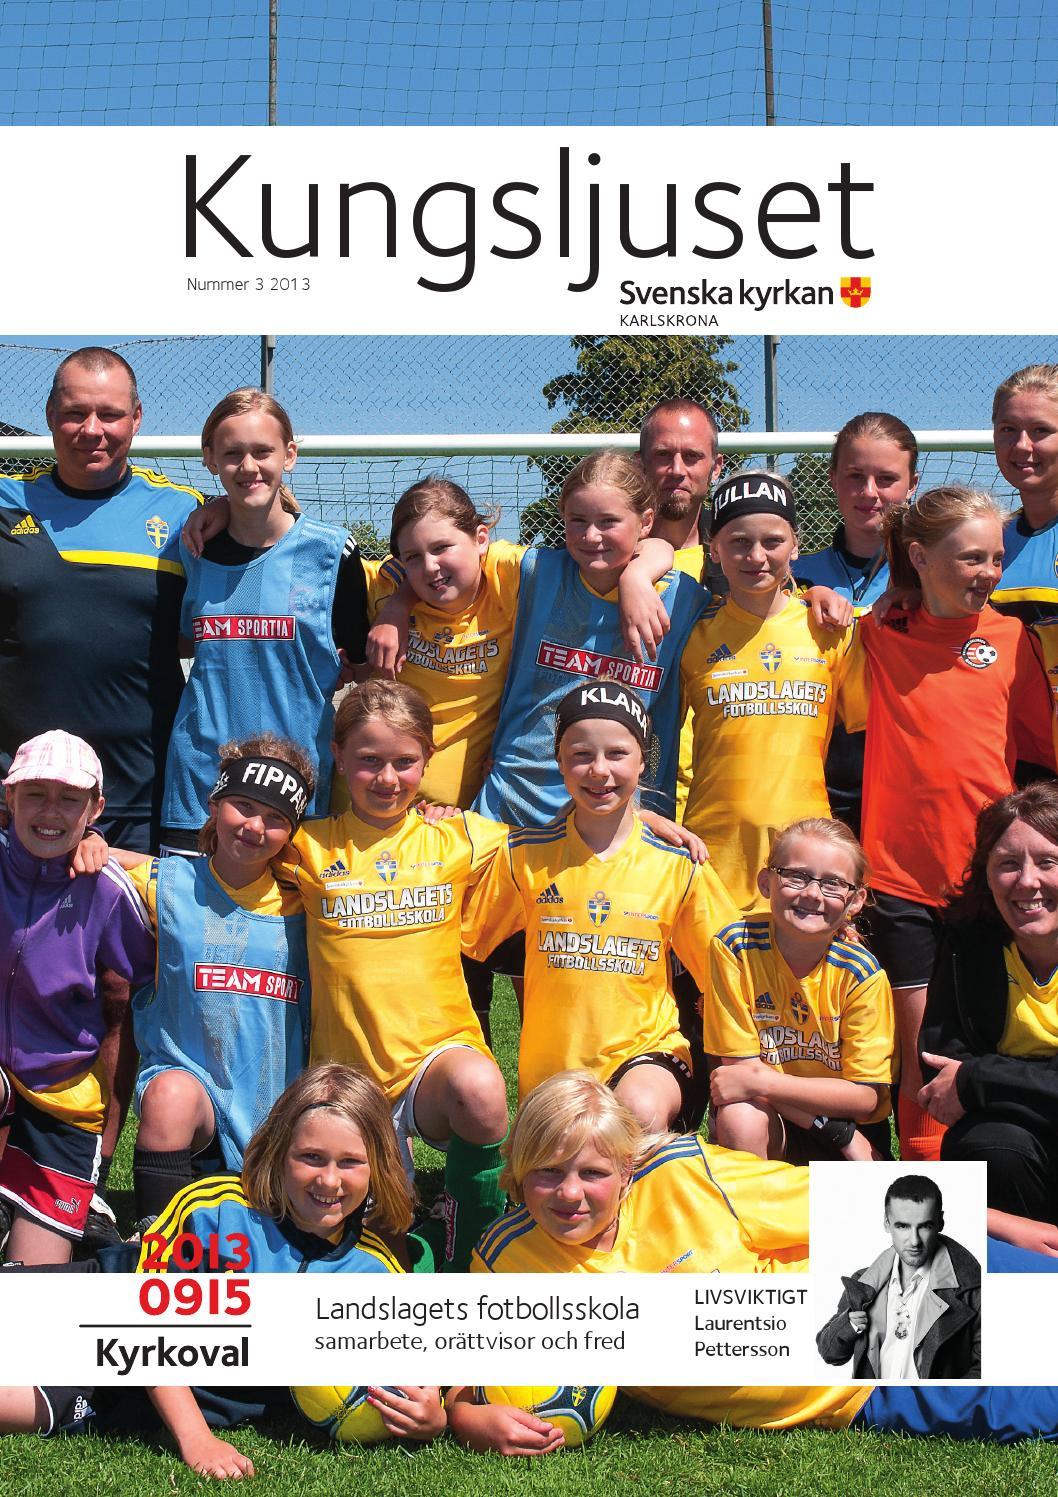 Trffa nya vnner frn Karlskrona - patient-survey.net